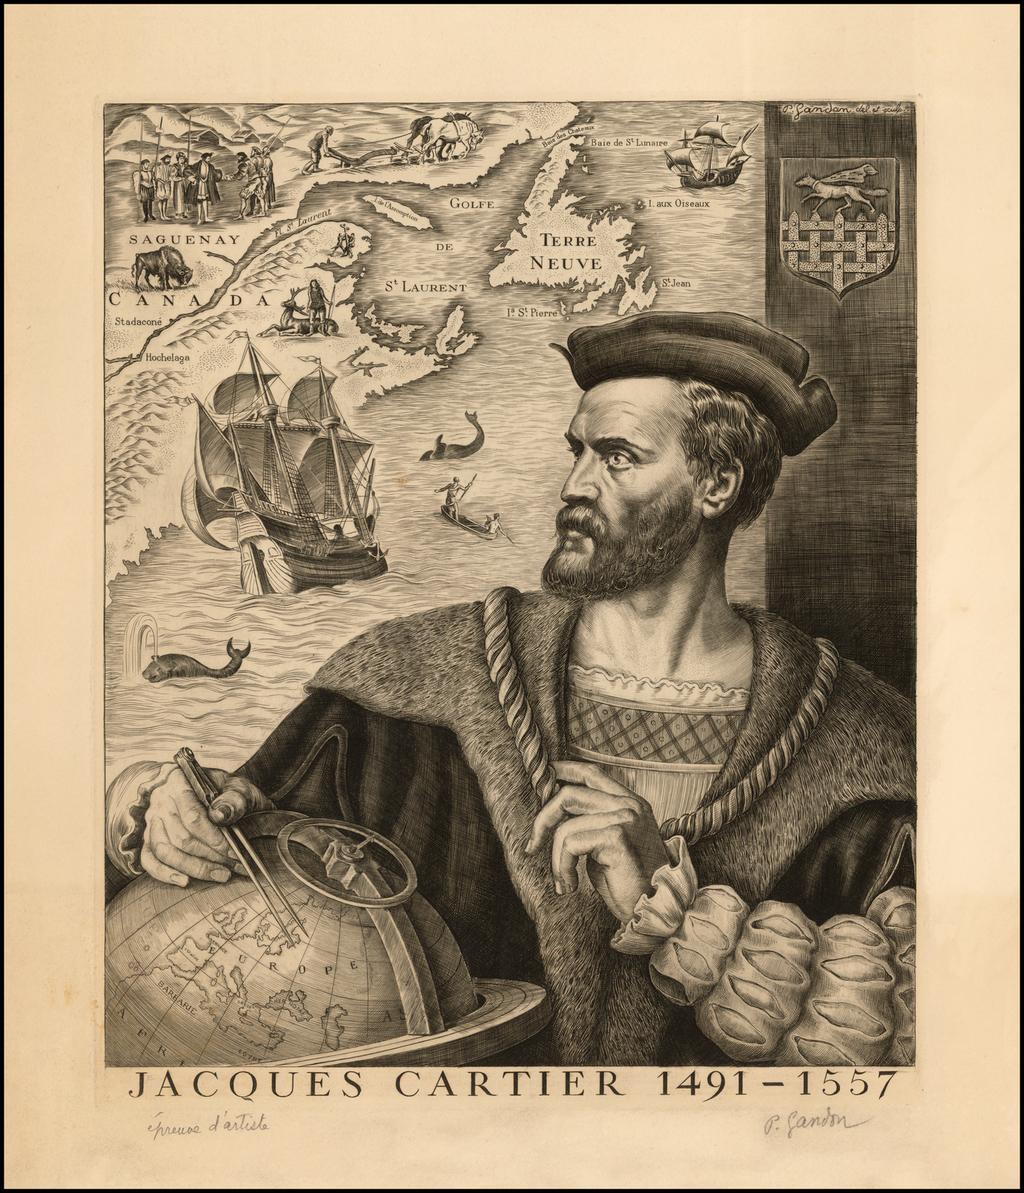 (Canada)  Jacques Cartier 1491-1557 By P. Landon